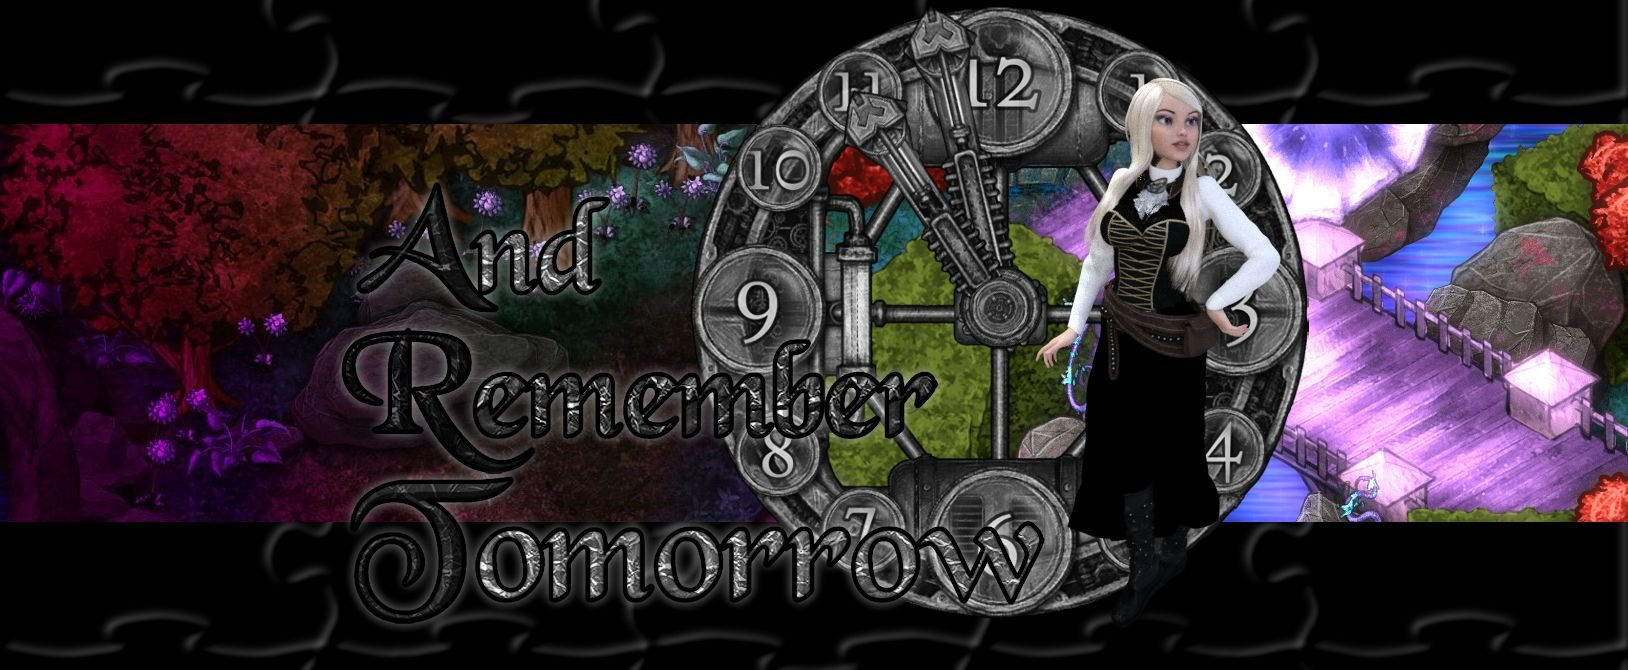 and_remember_tomorrow_logo.jpg